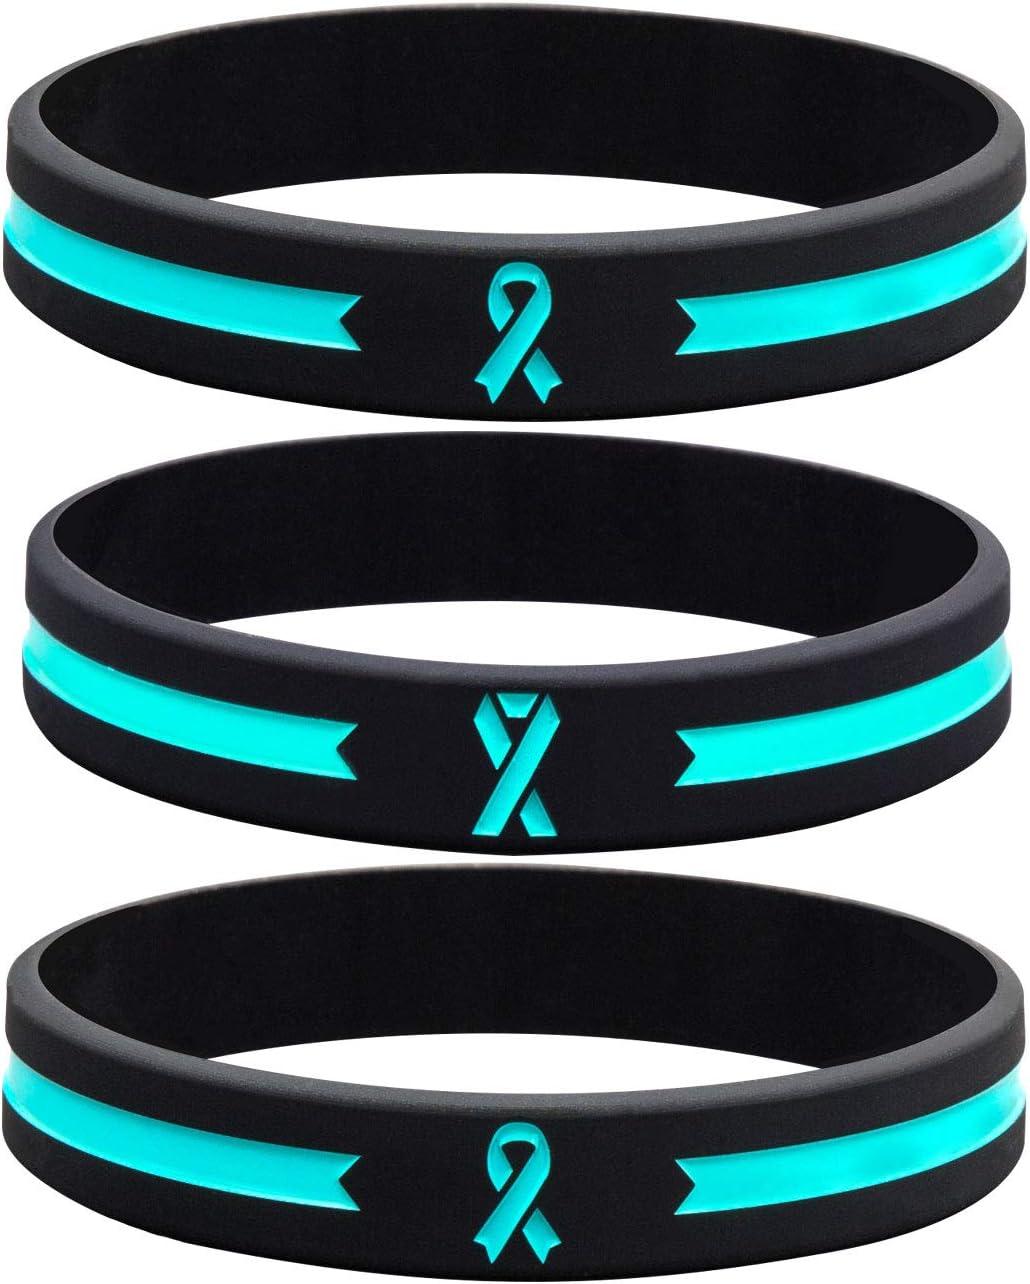 Sainstone Teal Awareness Ribbon Silicone Bracelets, Mental Health Awareness Bracelet, Teal Ribbon Wristbands Unisex for Men Women